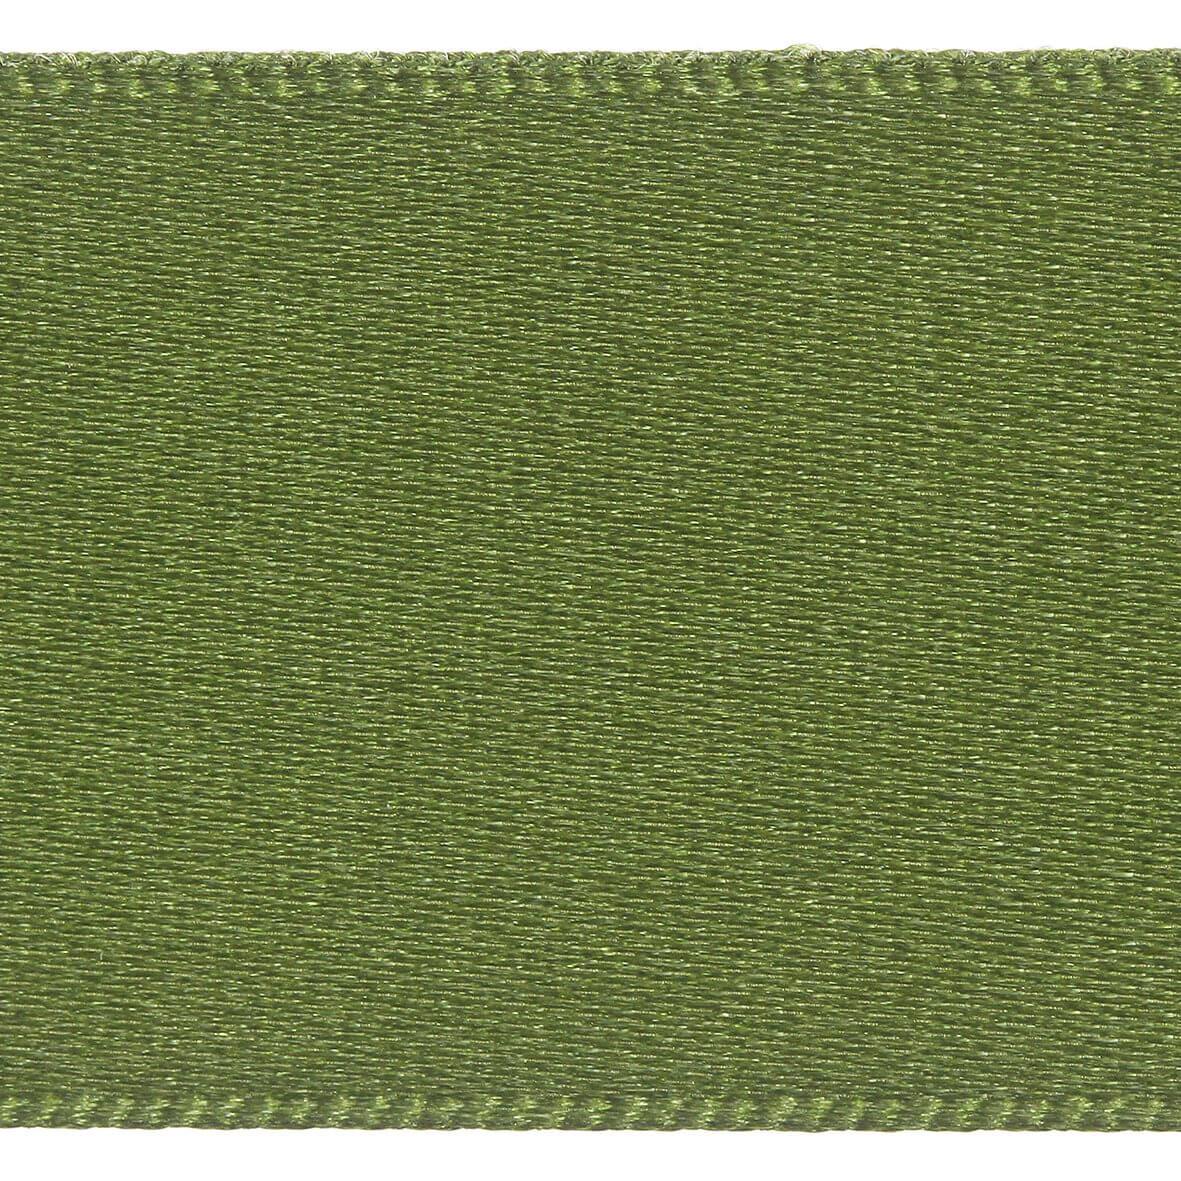 25mm Berisfords Satin Ribbon - Cypress Colour 980